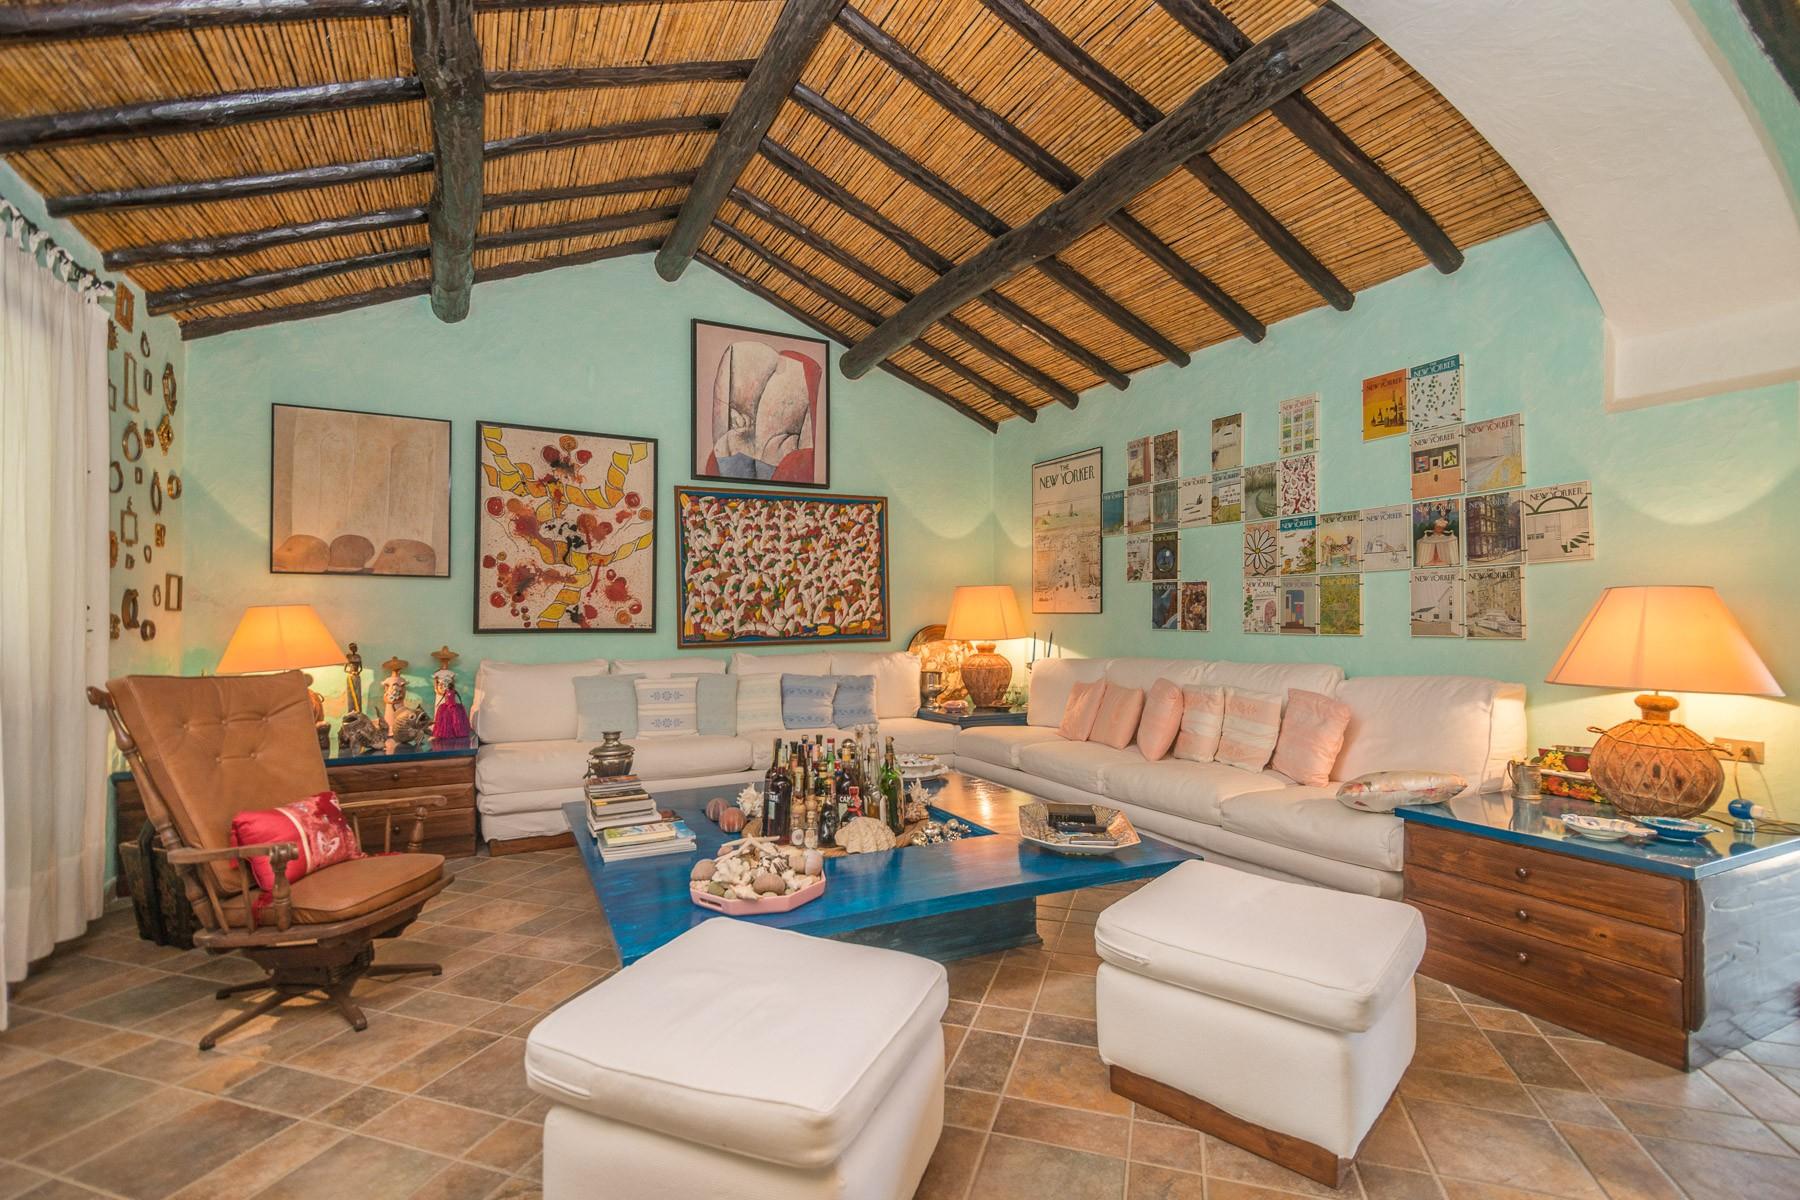 Casa indipendente in Vendita a Olbia: 5 locali, 230 mq - Foto 7